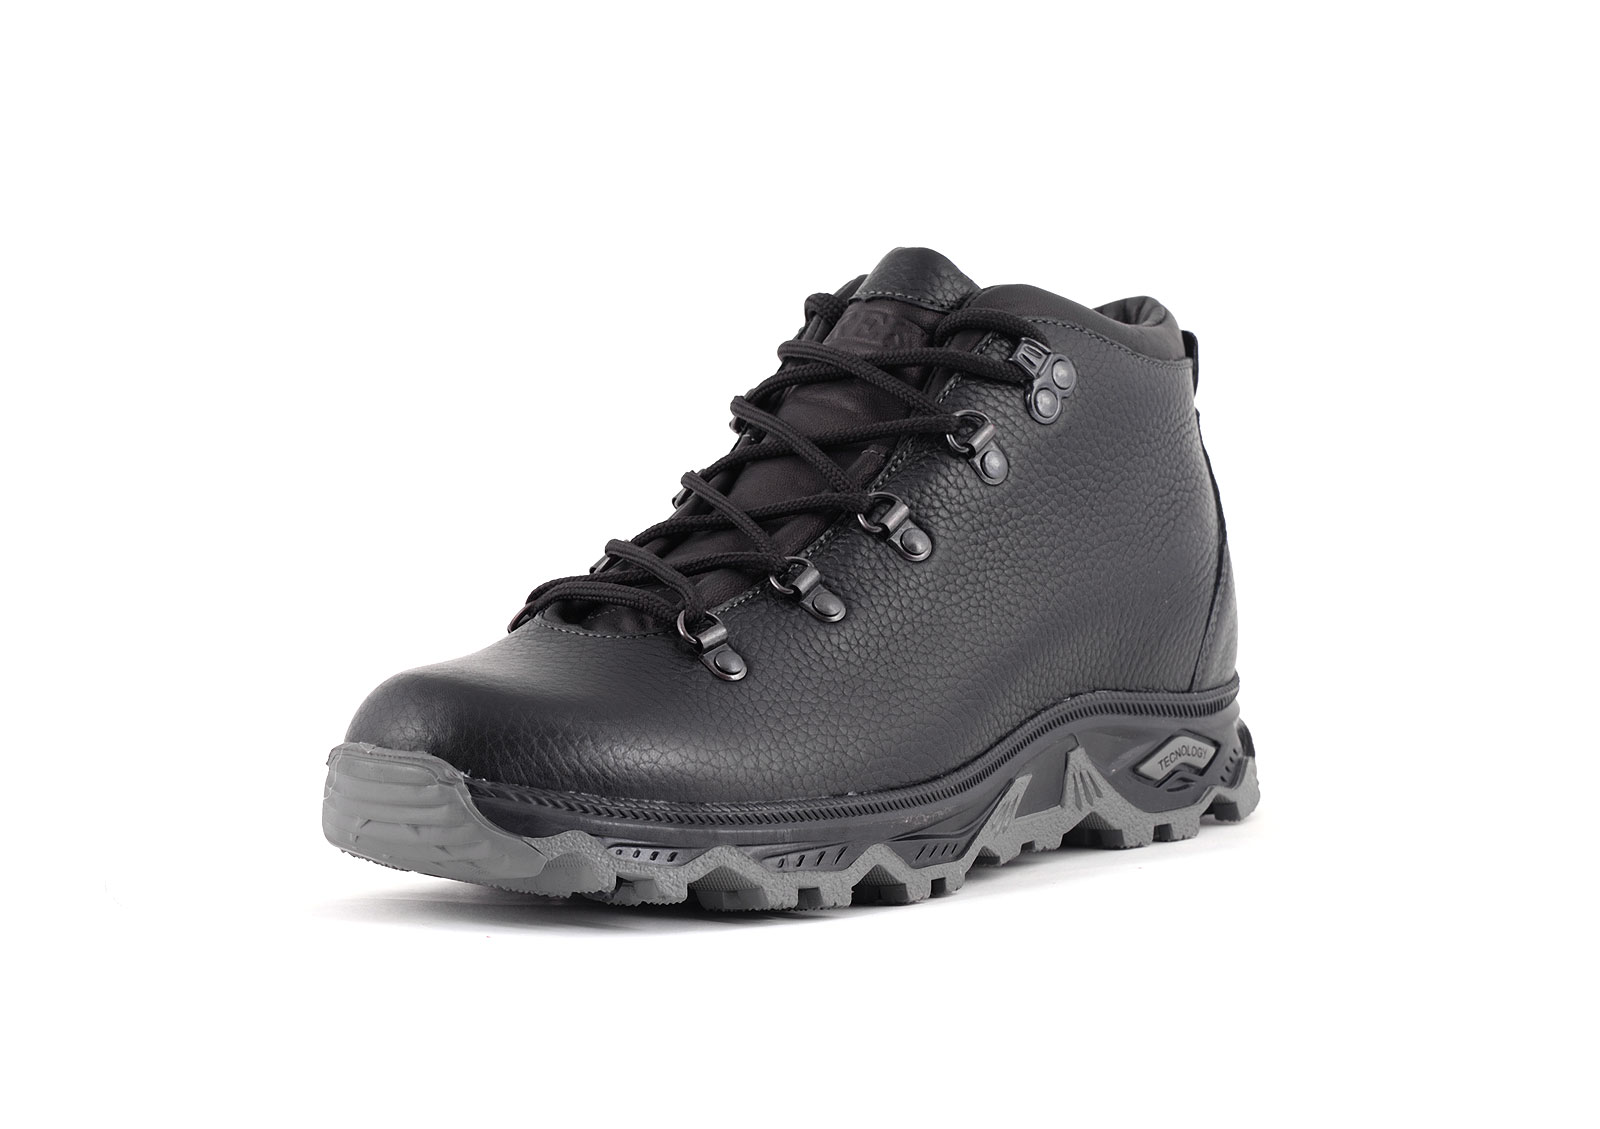 Ботинки TREK Andes1 (капровелюр), Ботинки - арт. 1129340177